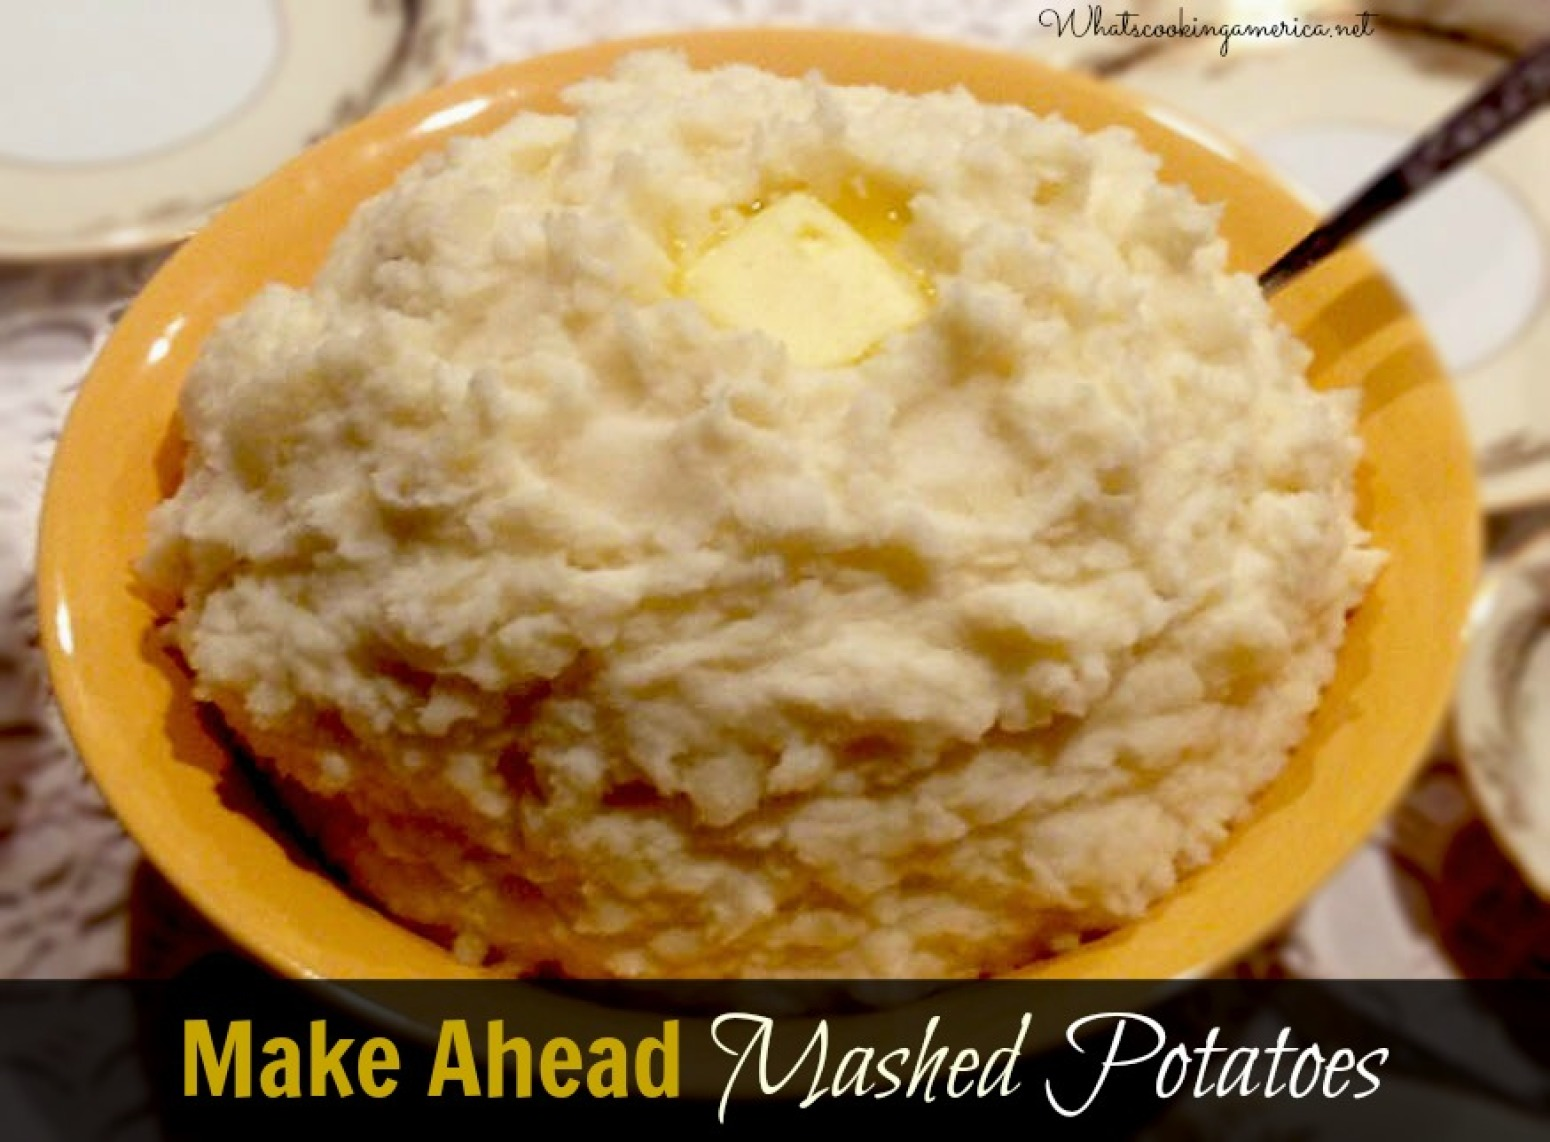 Best MakeAhead Mashed Potato Recipe Perfect Mashed Potato ... - photo#29